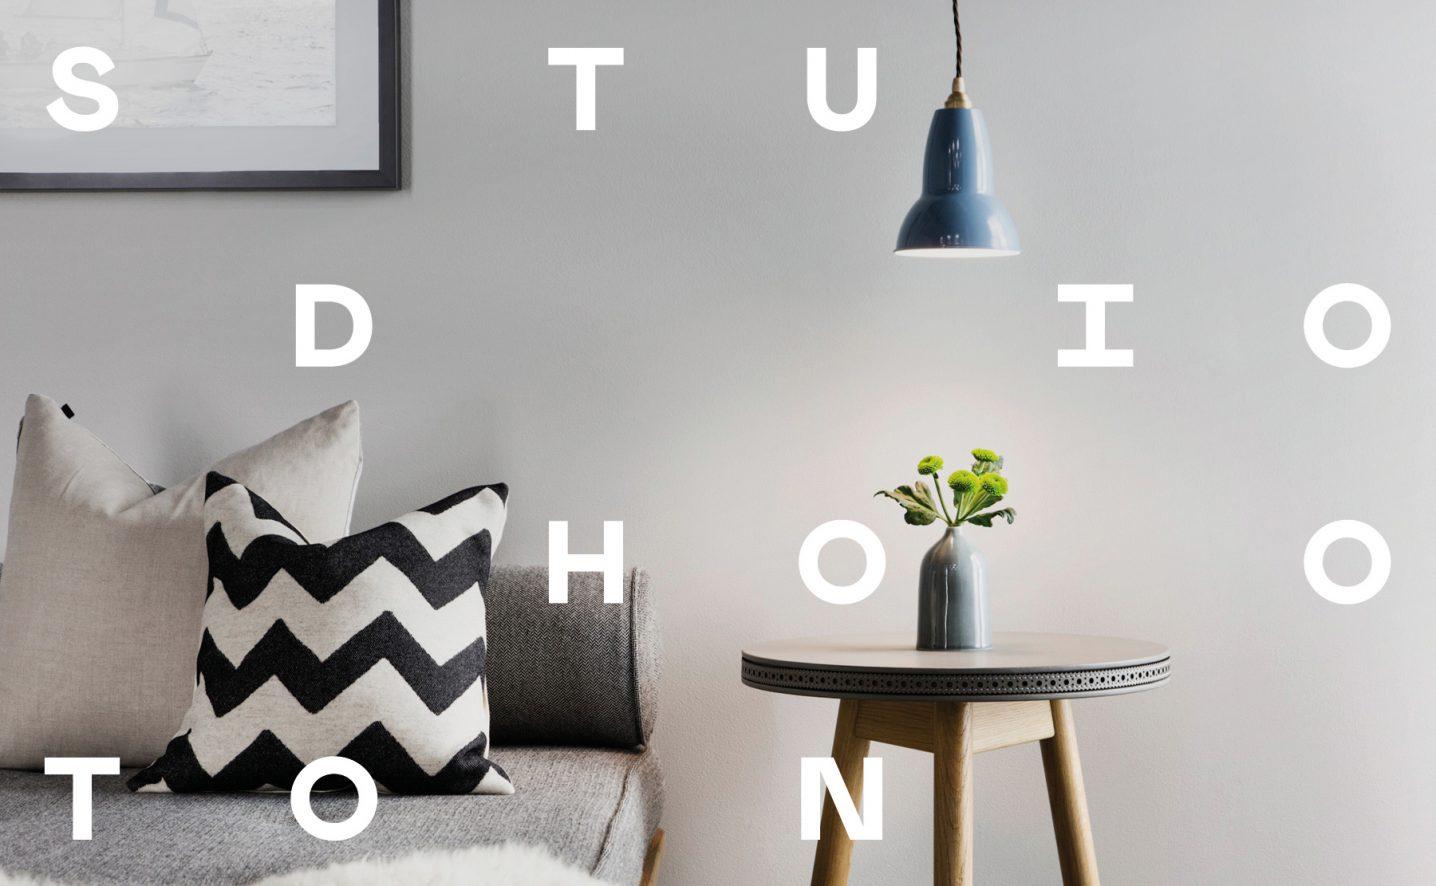 Studio Hooton Branding